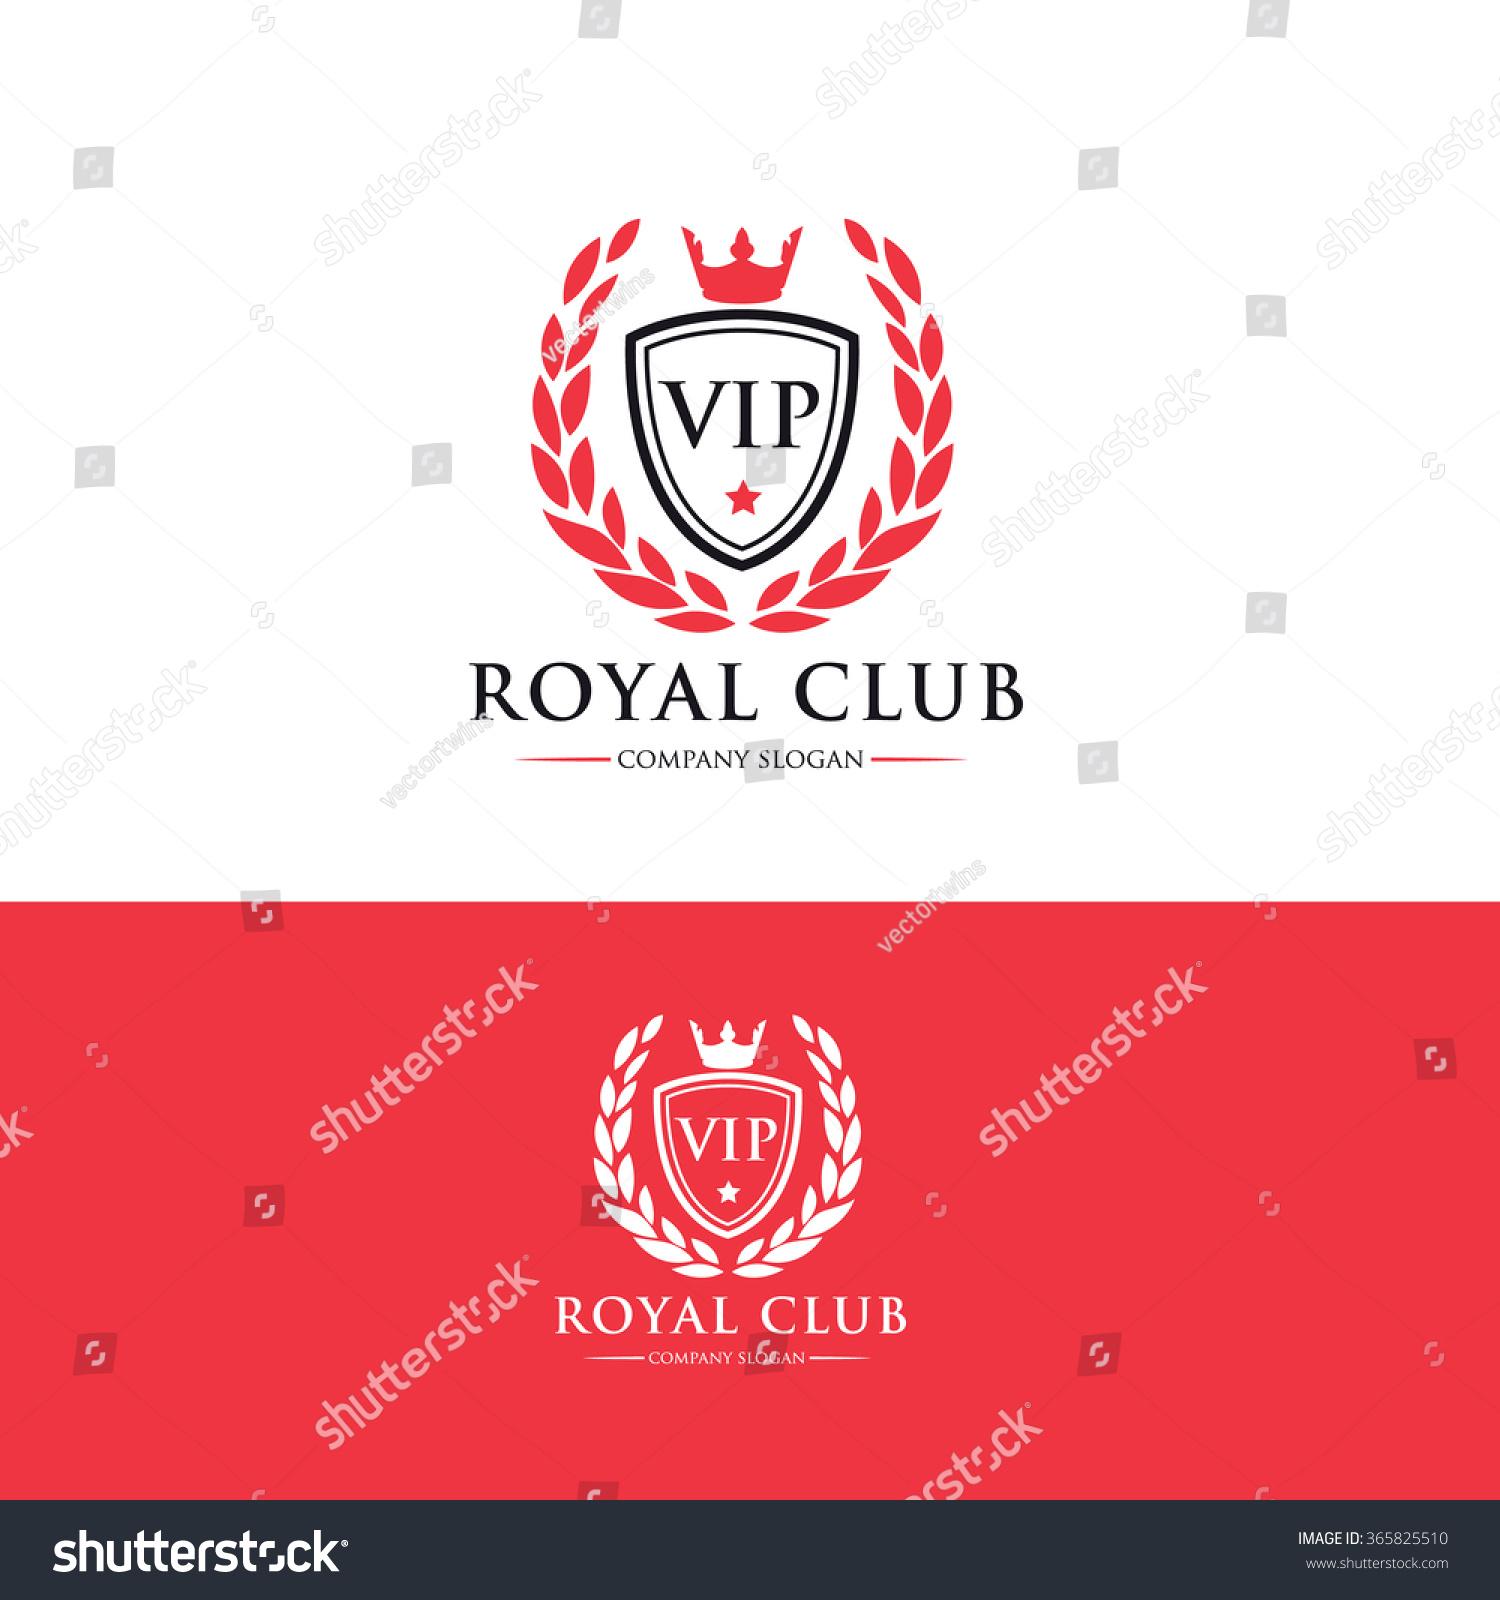 vip club logo royal logo crests logo vector logo template 365825510 shutterstock. Black Bedroom Furniture Sets. Home Design Ideas